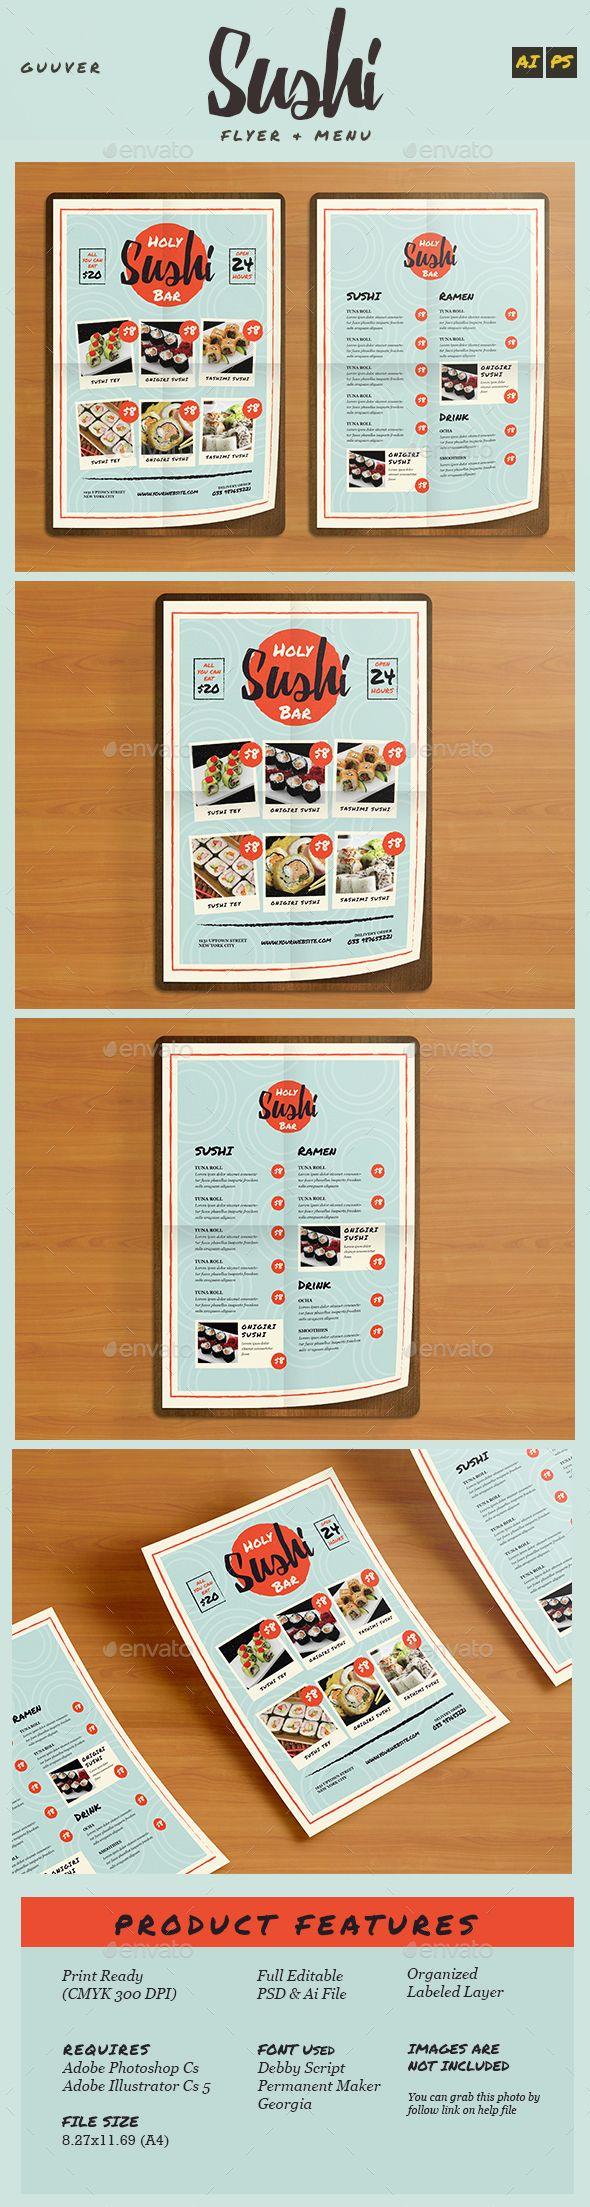 Sushi Bar Restaurant Menu/Flyer | Pinterest